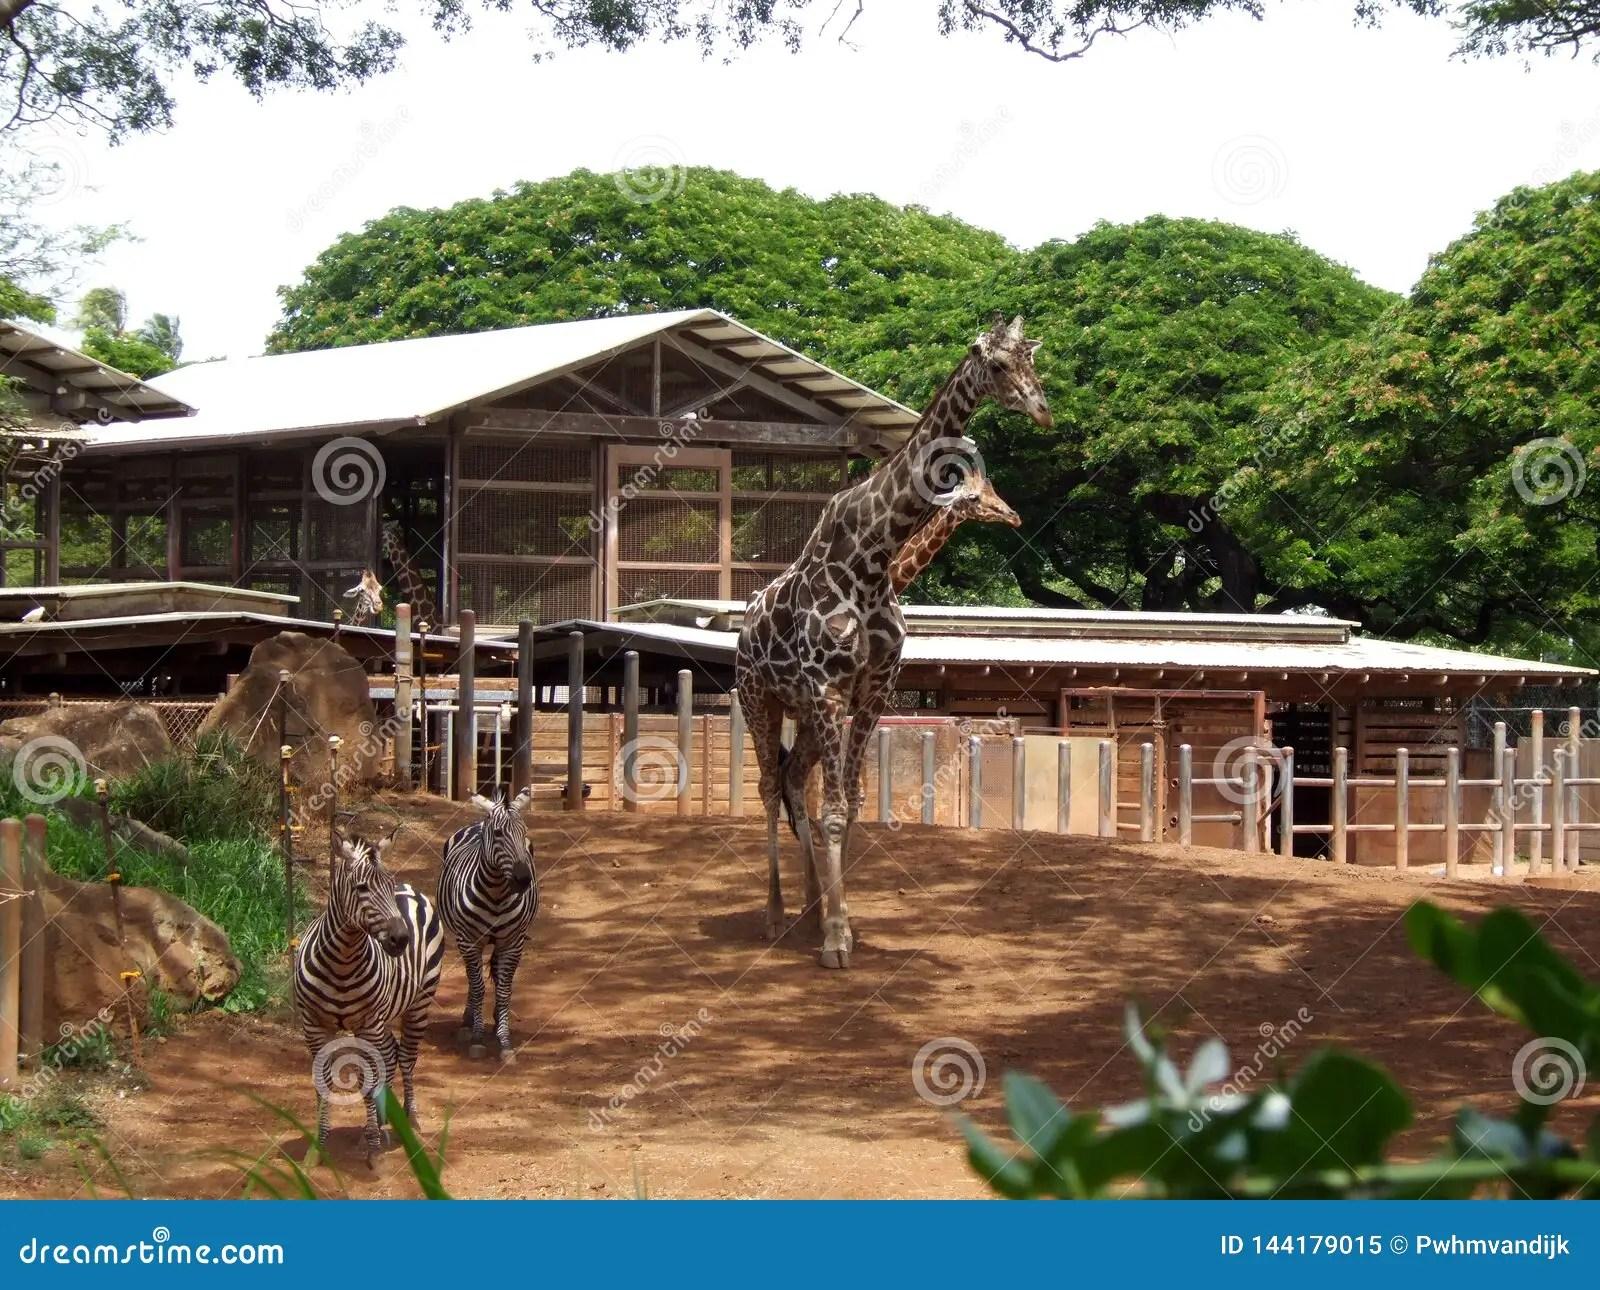 Giraffe And Zebra In The Zoo Of Hawaii Stock Image